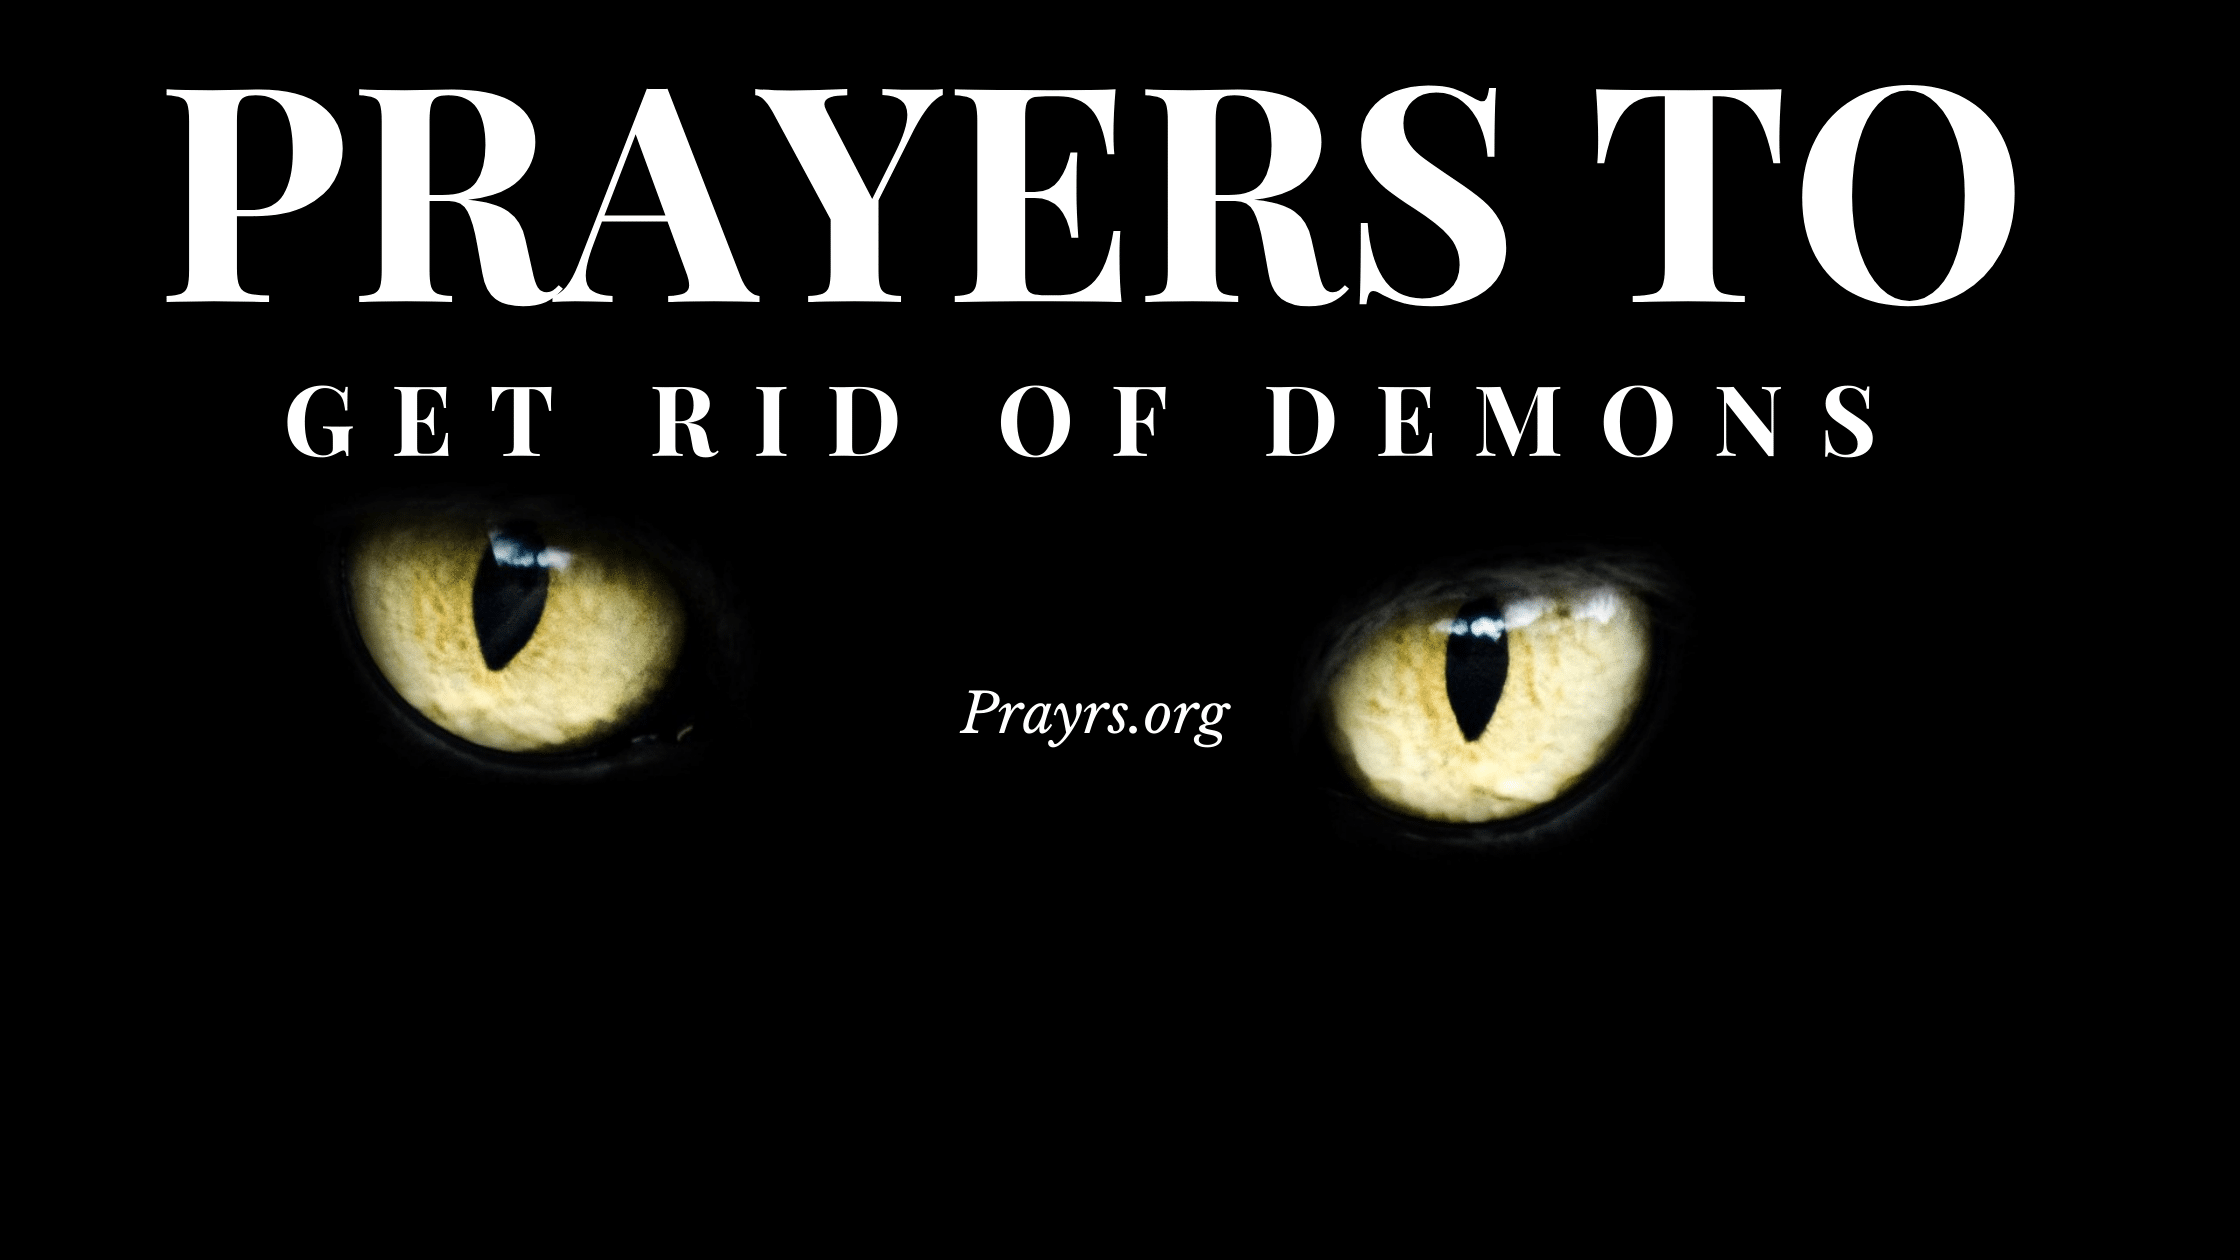 prayers to get rid of demons